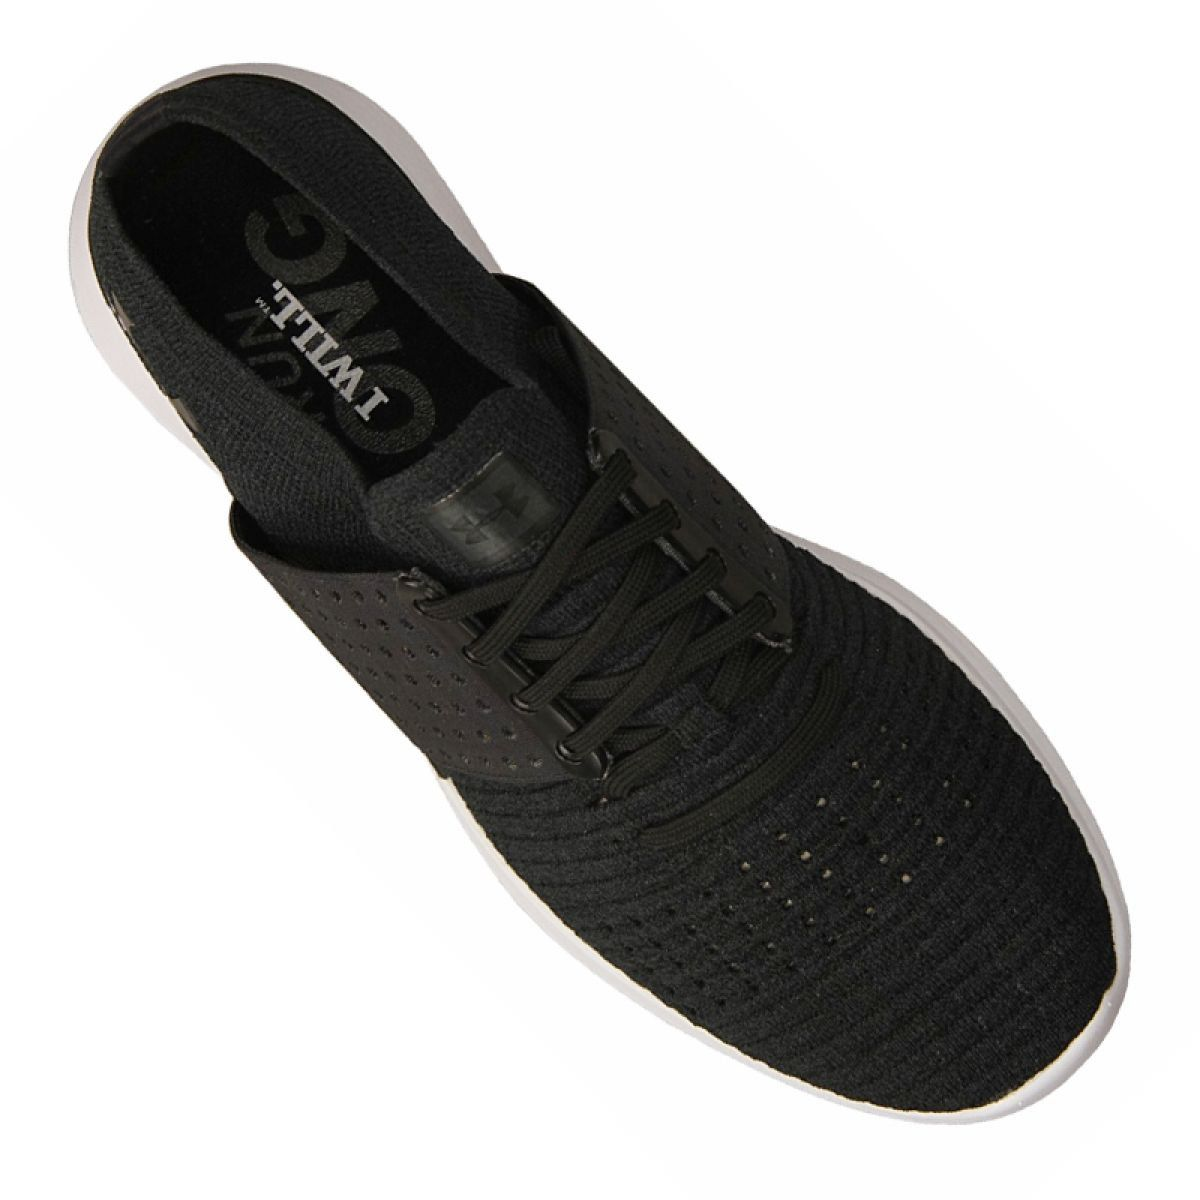 Buty Biegowe Under Armour Threadborne Slingwrap M 1295724 001 Czarne Under Armour All Black Sneakers Armour